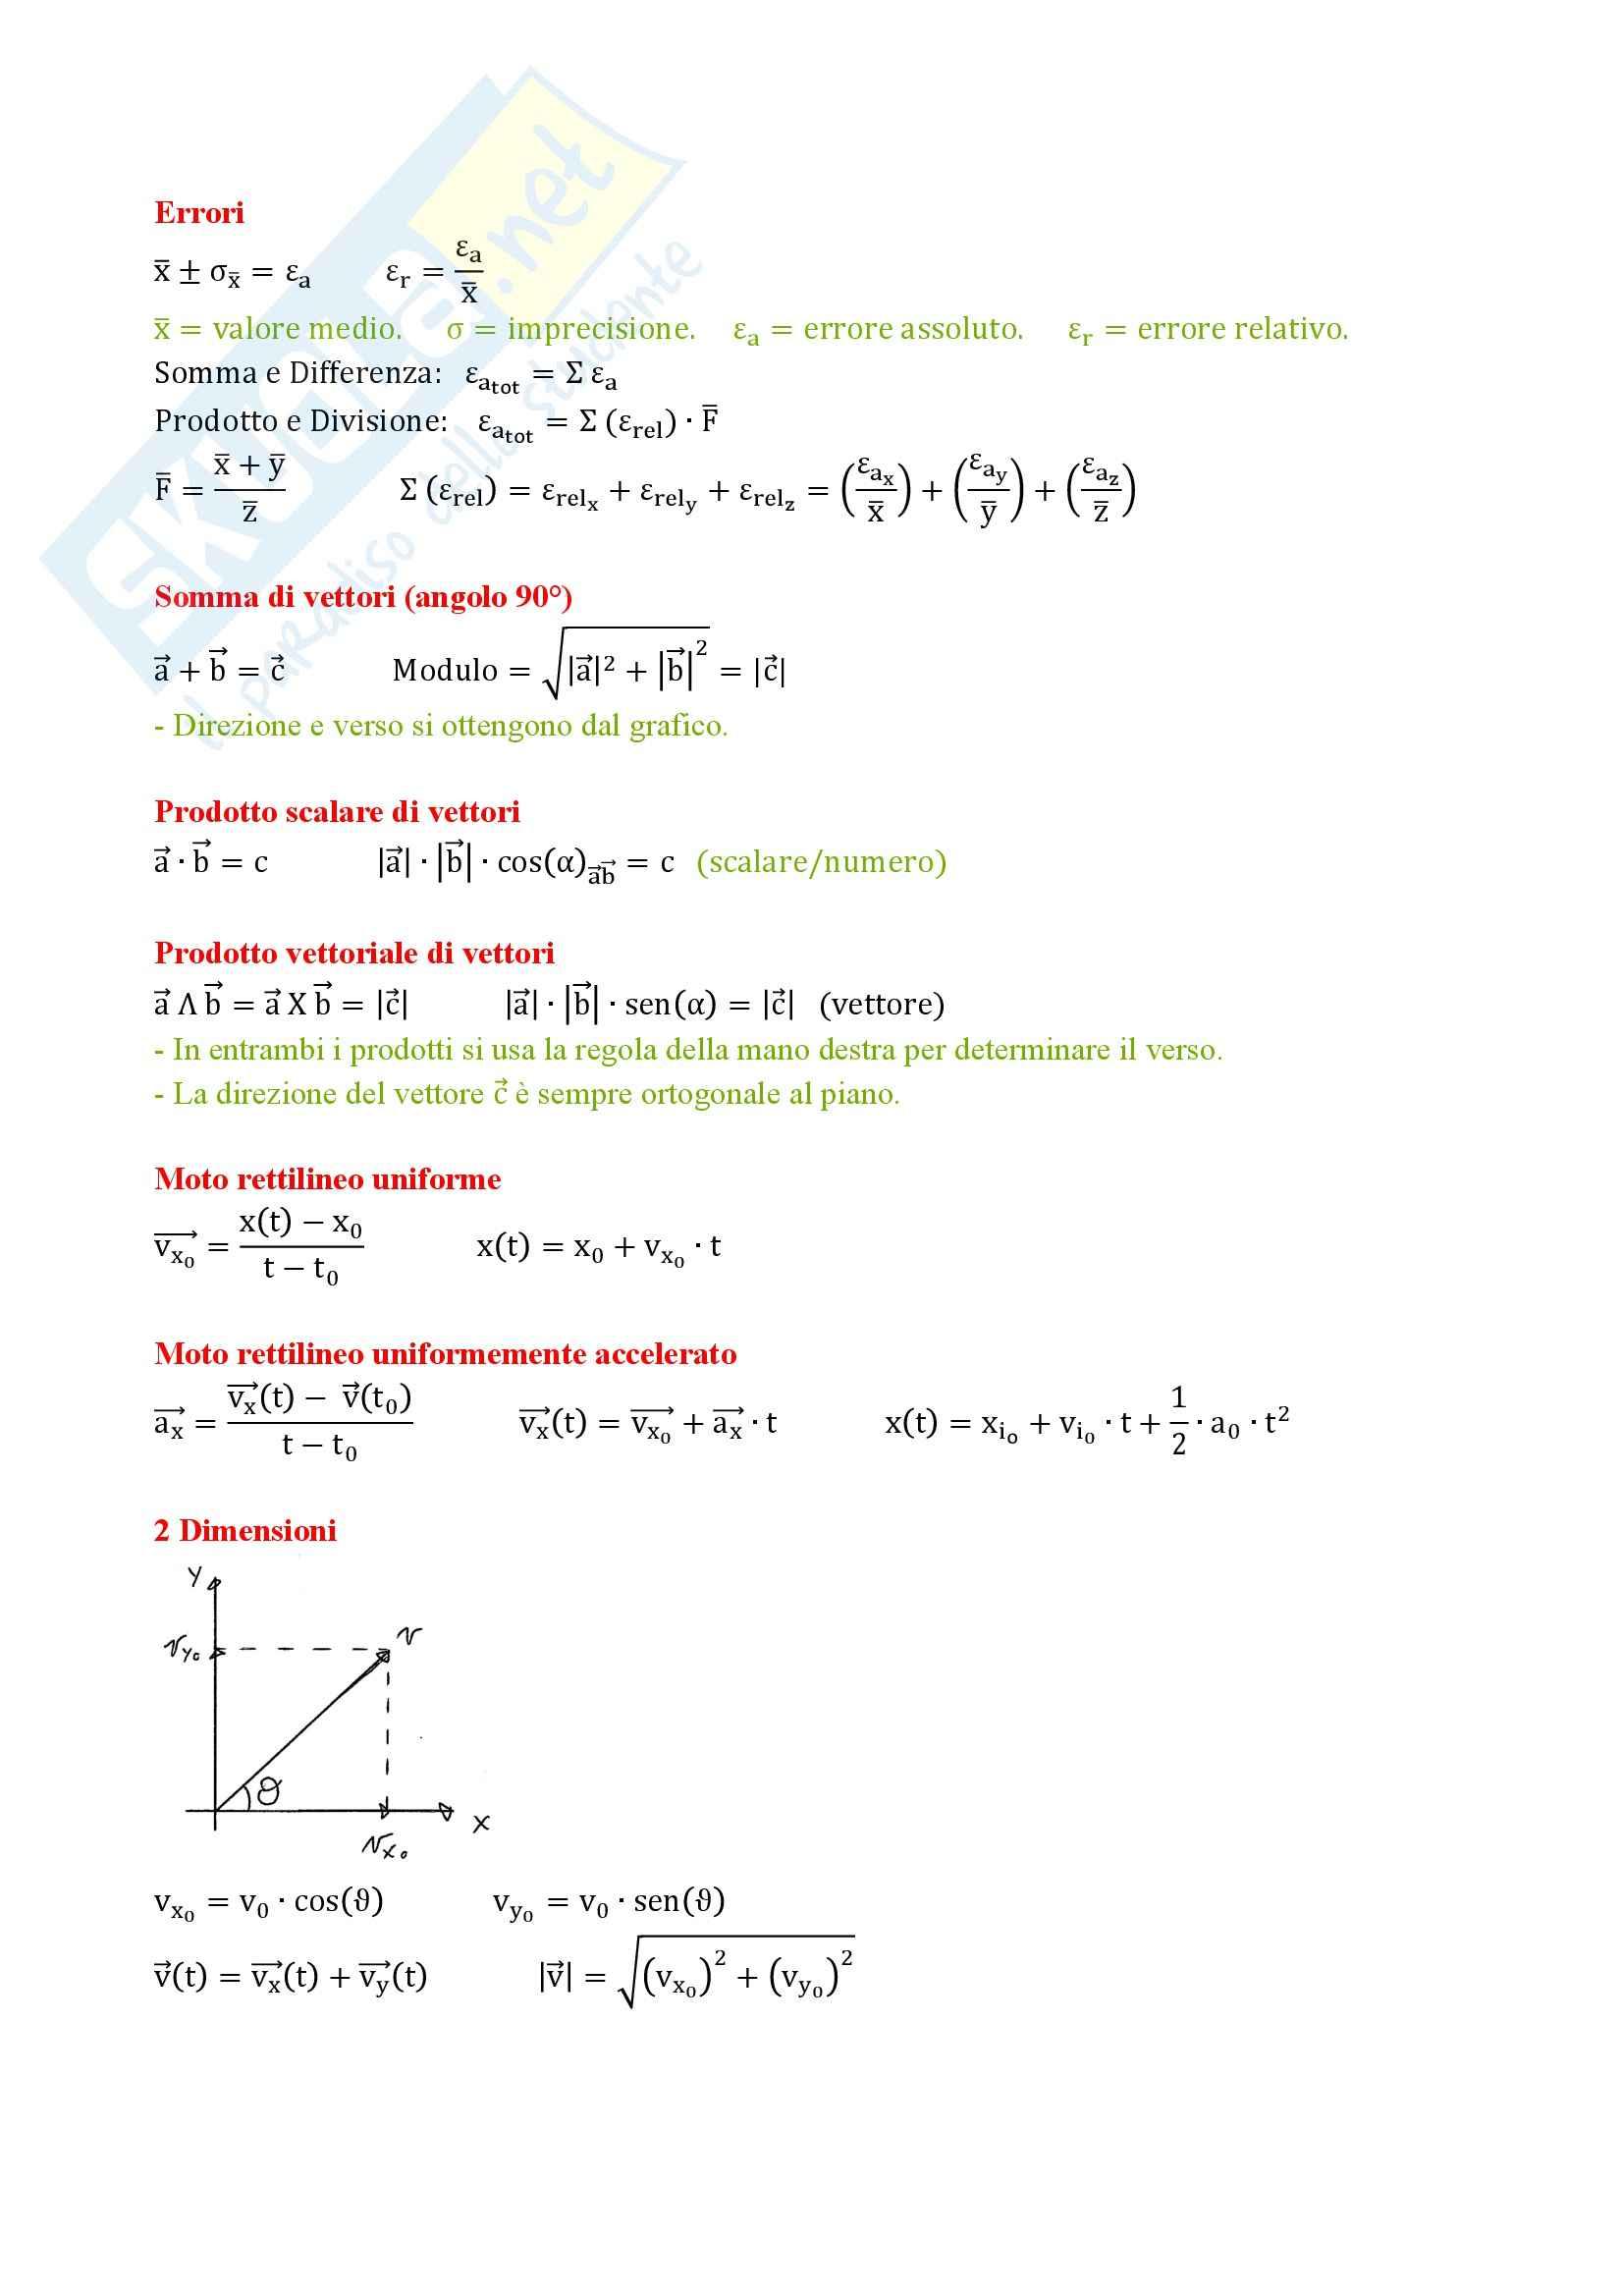 Fisica - Formule moti, termodinamica, elettromagnetismo